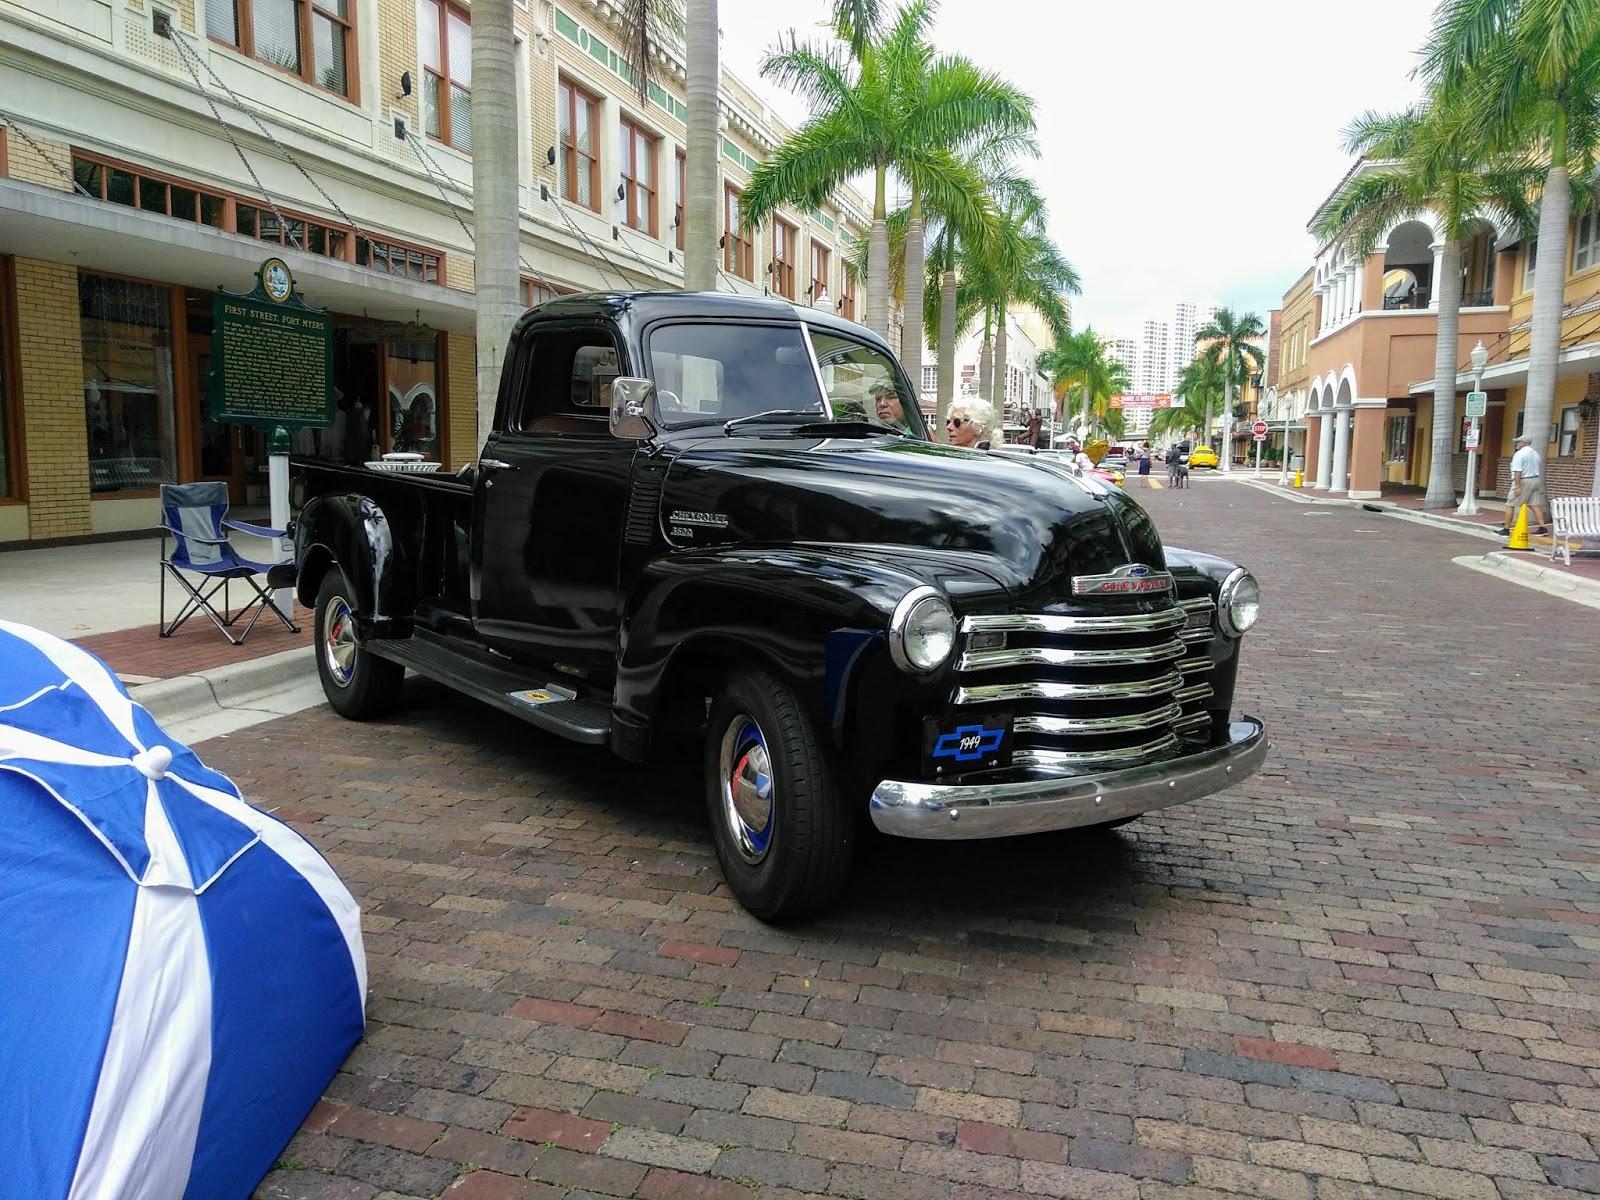 Cars Poinsettia Drive - Old town florida car show